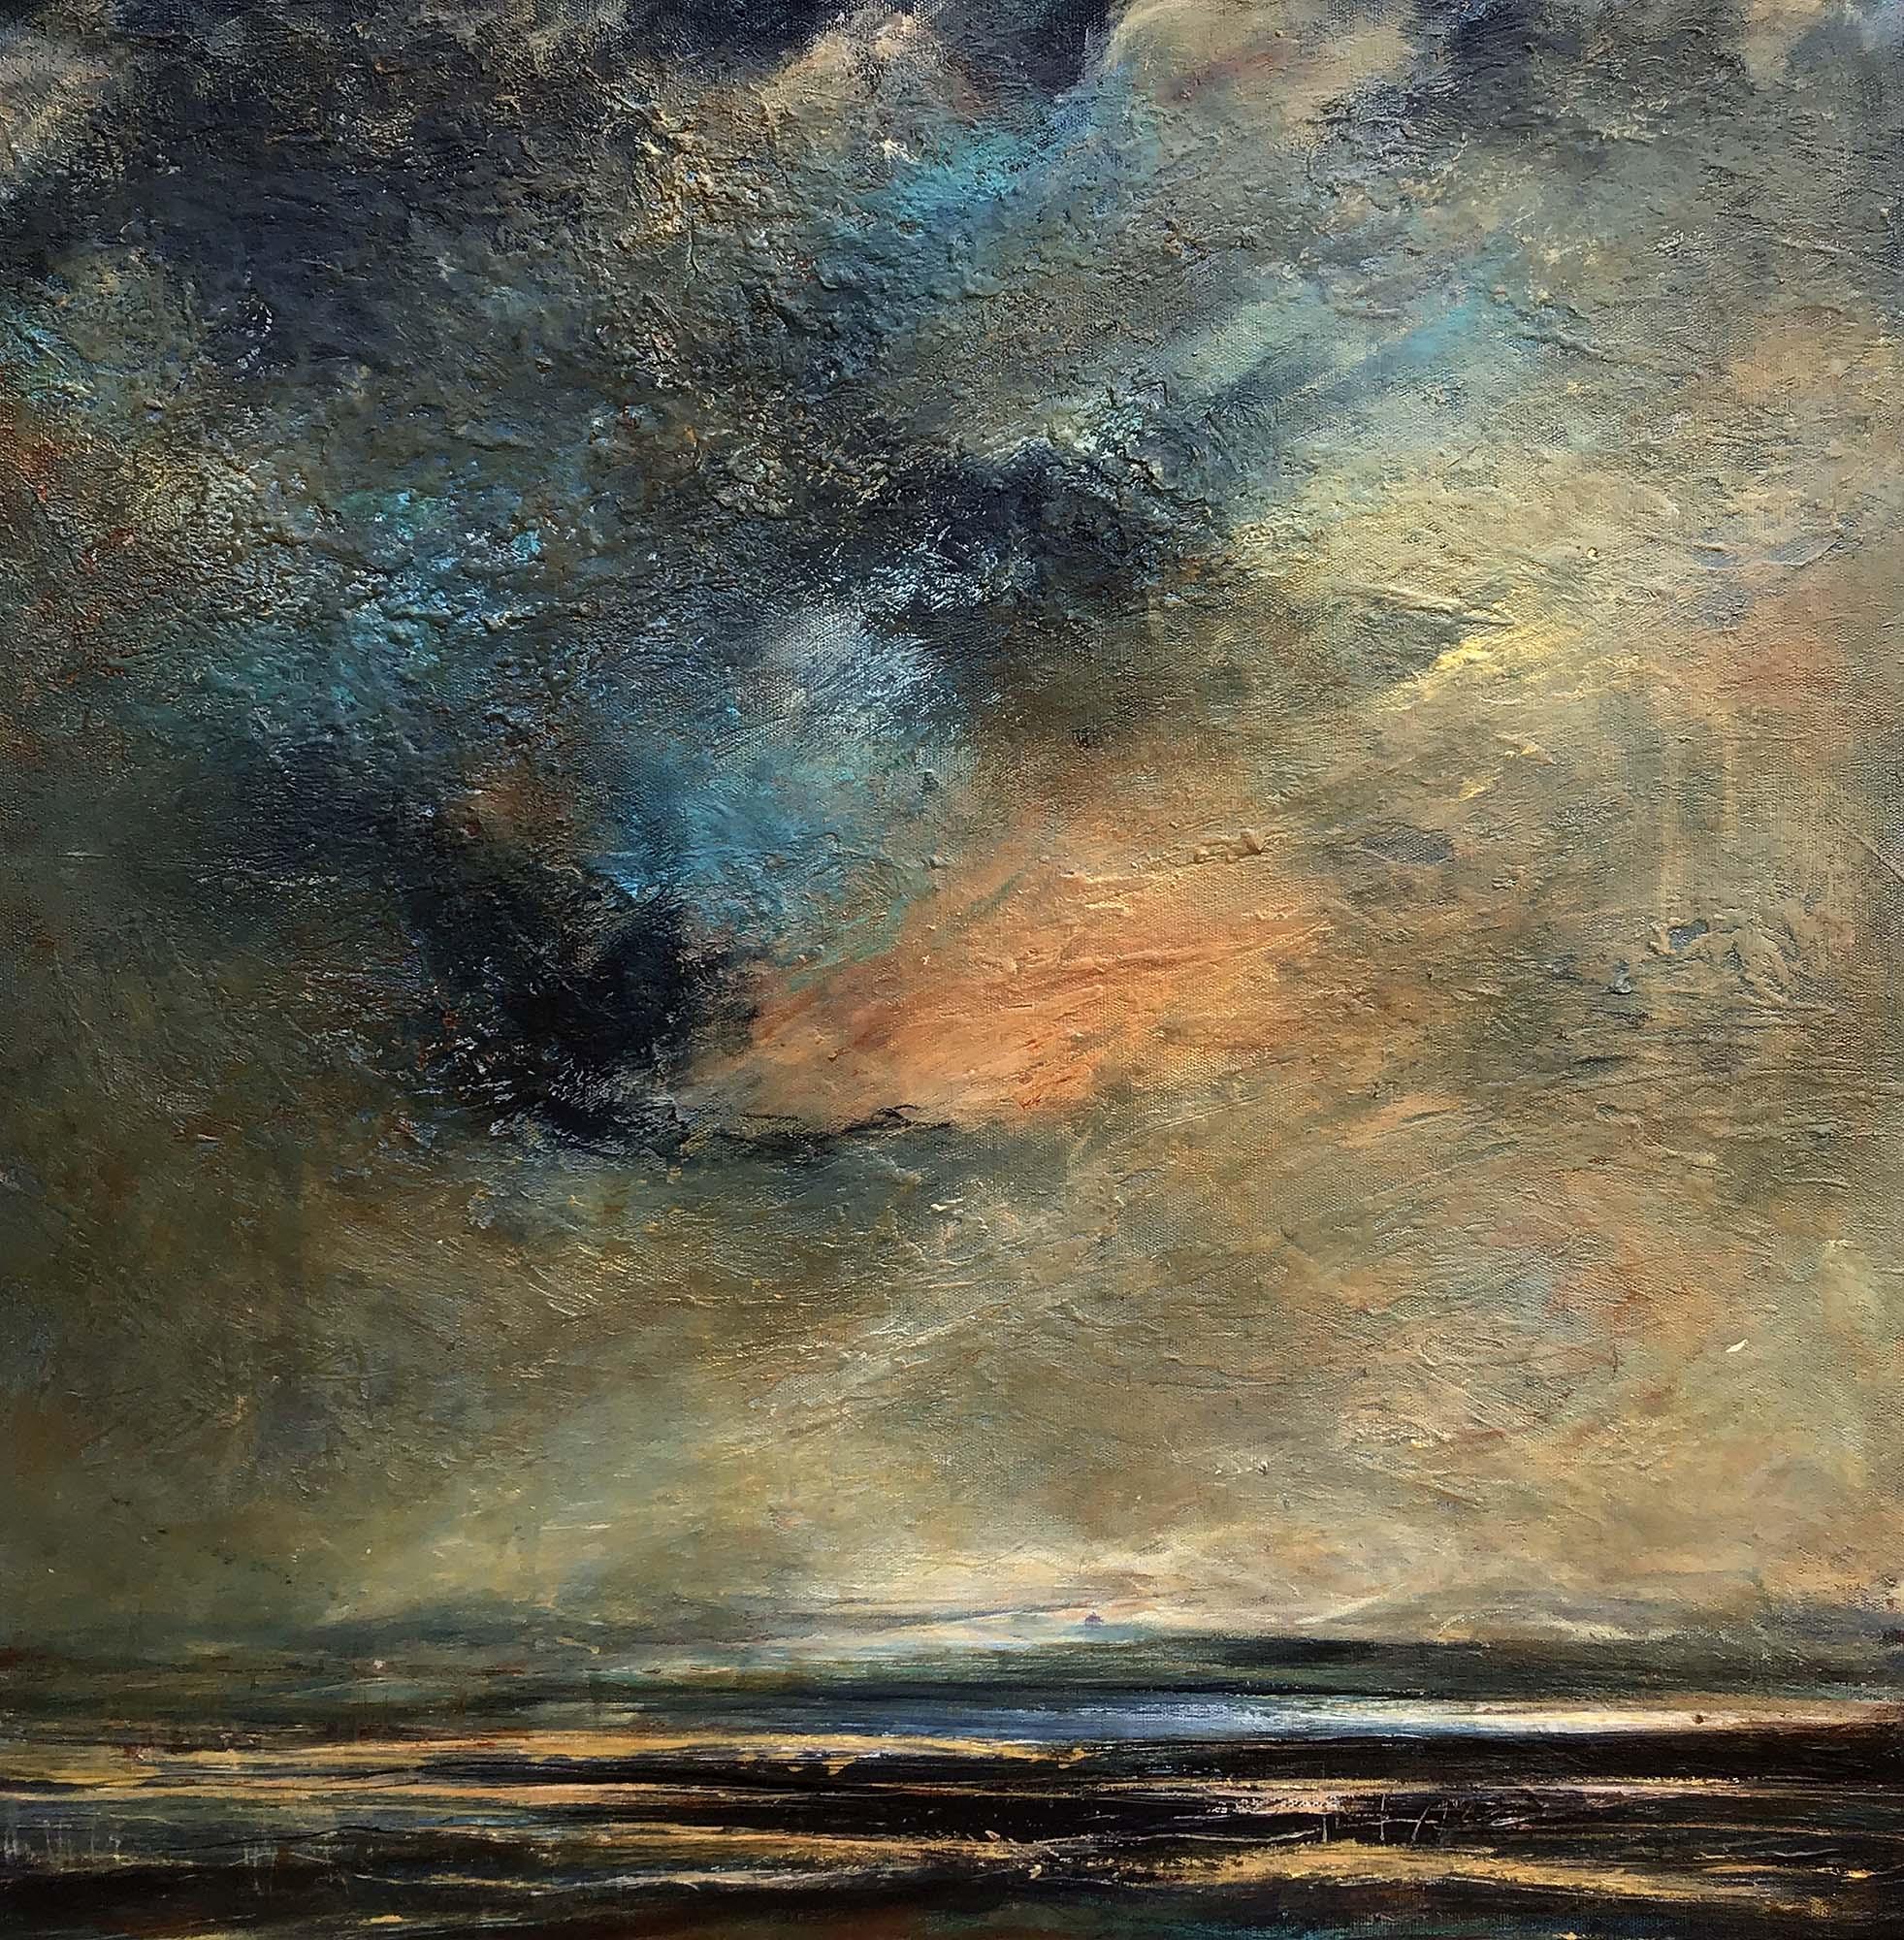 Painter Tania Chanter